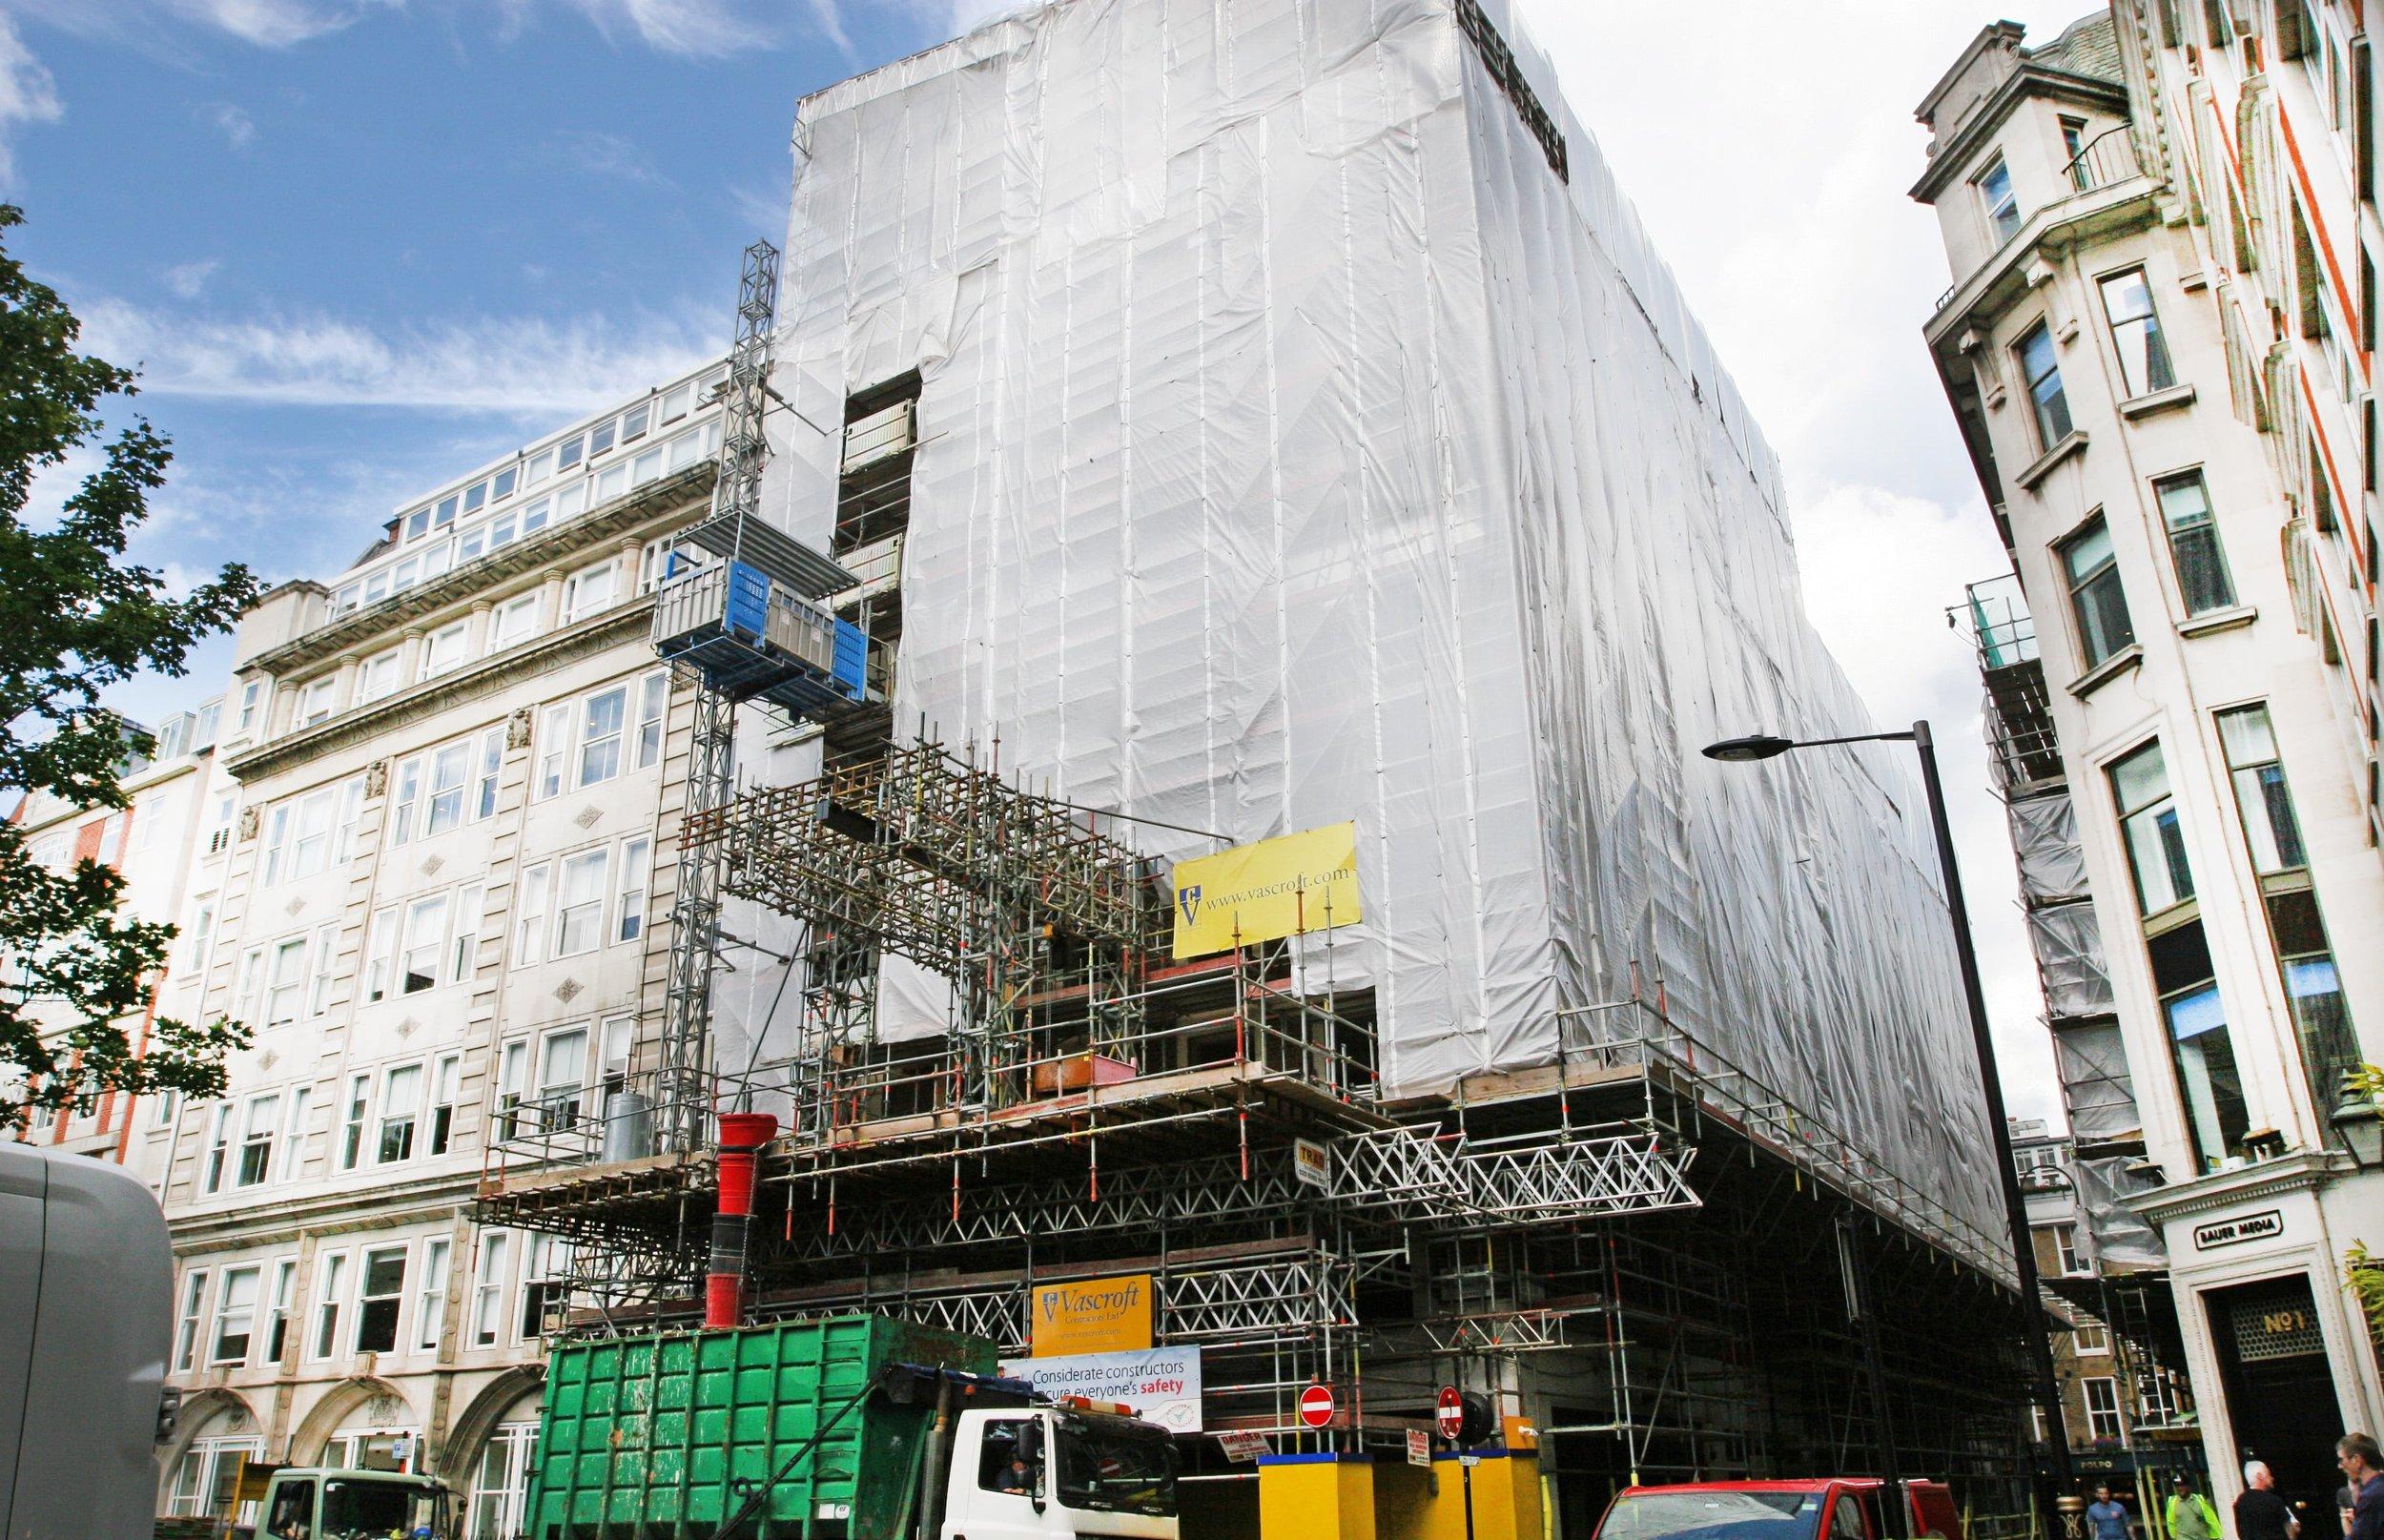 Scaffolding design for residential redevelopment